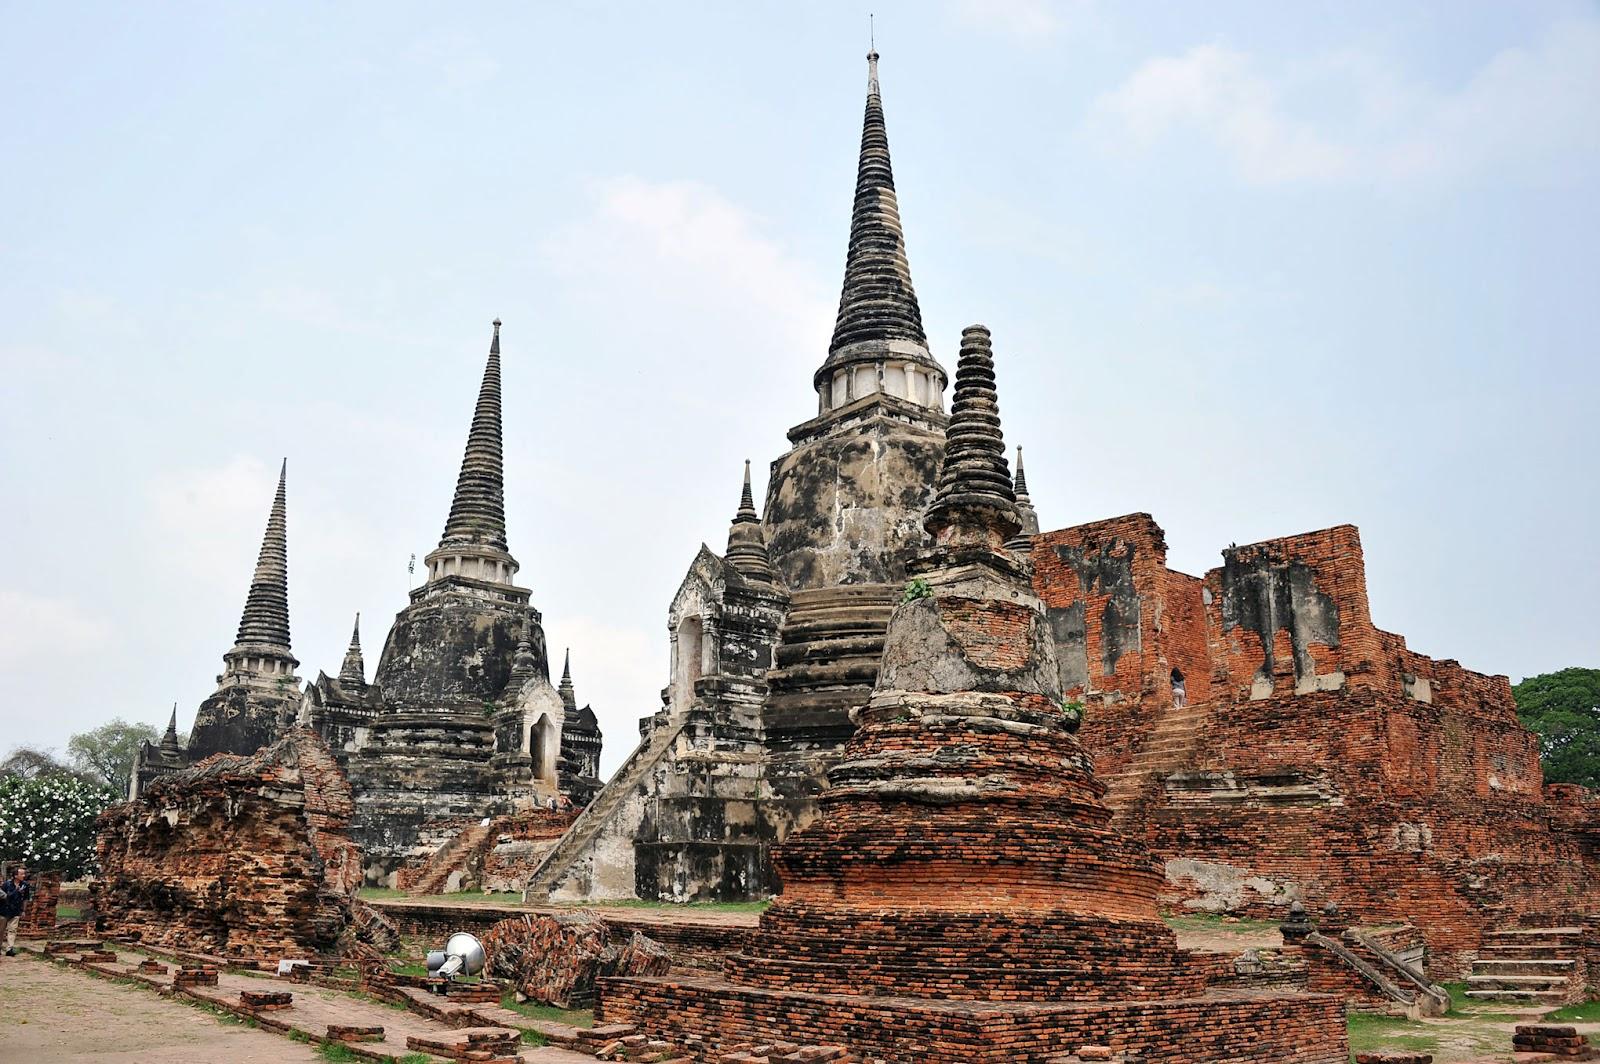 Ayutthaya Historical Park to be Restored  The World Travel